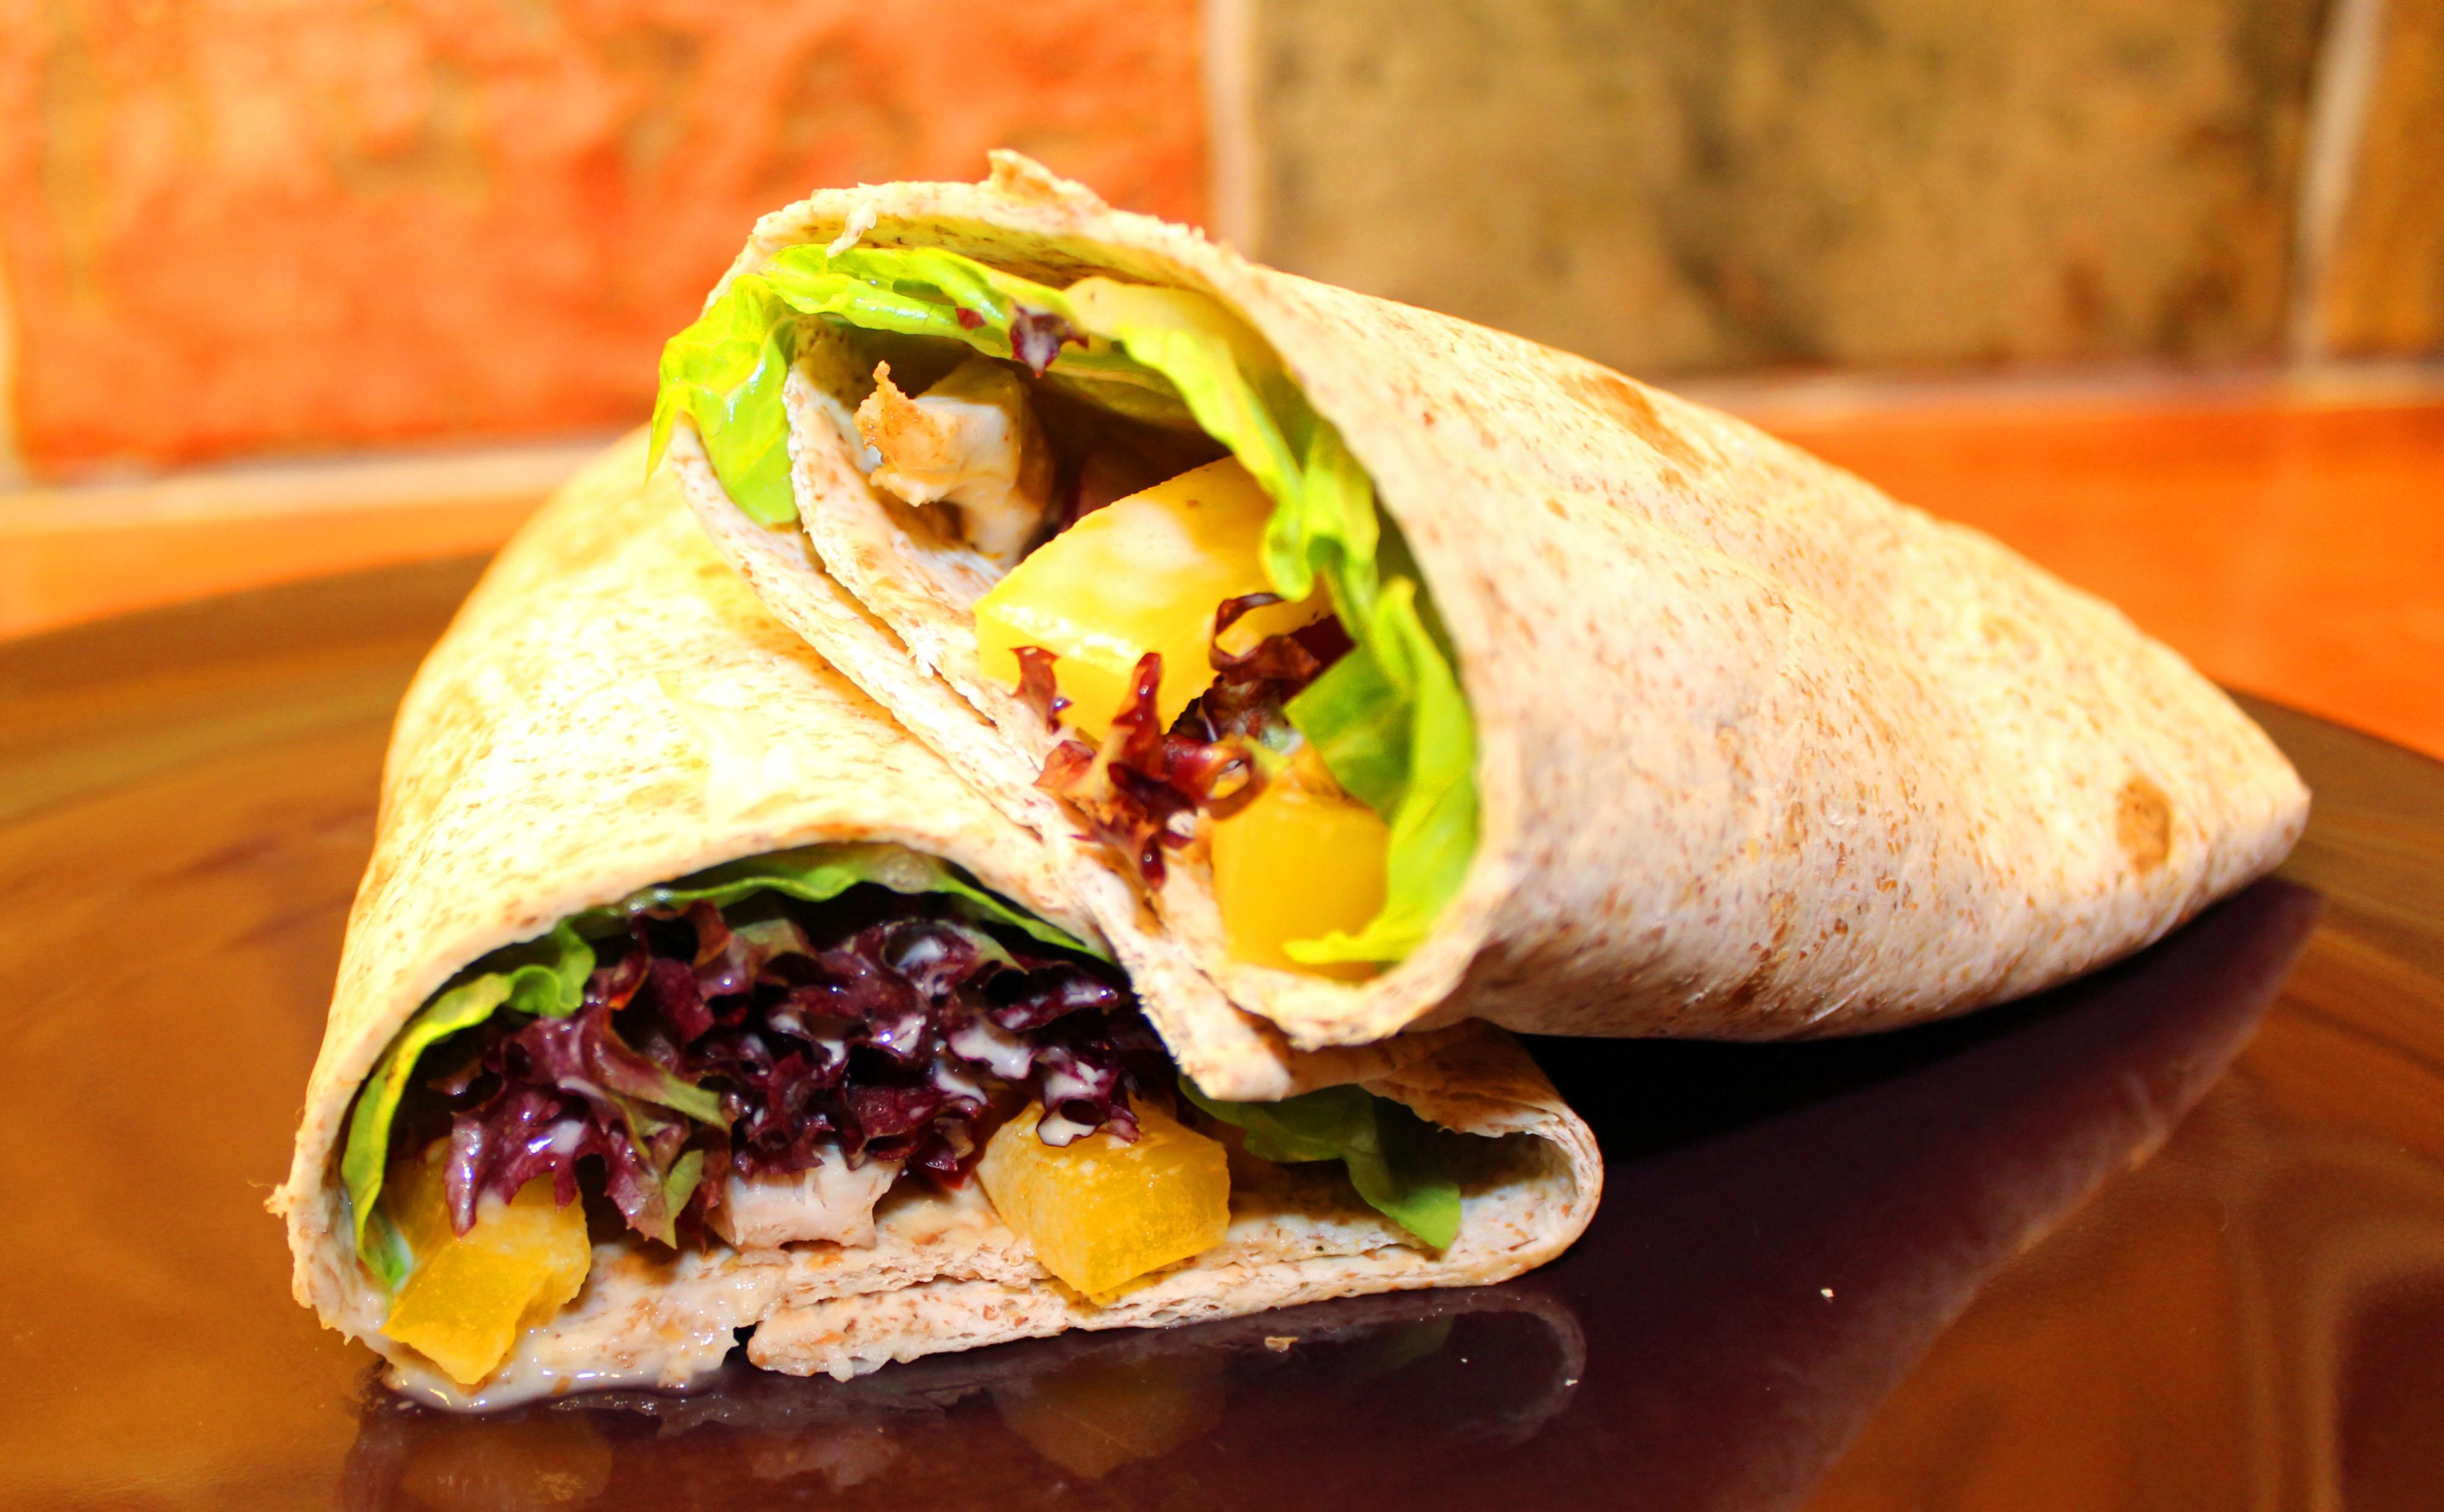 IMG_97577 | Eat Clean Food Now